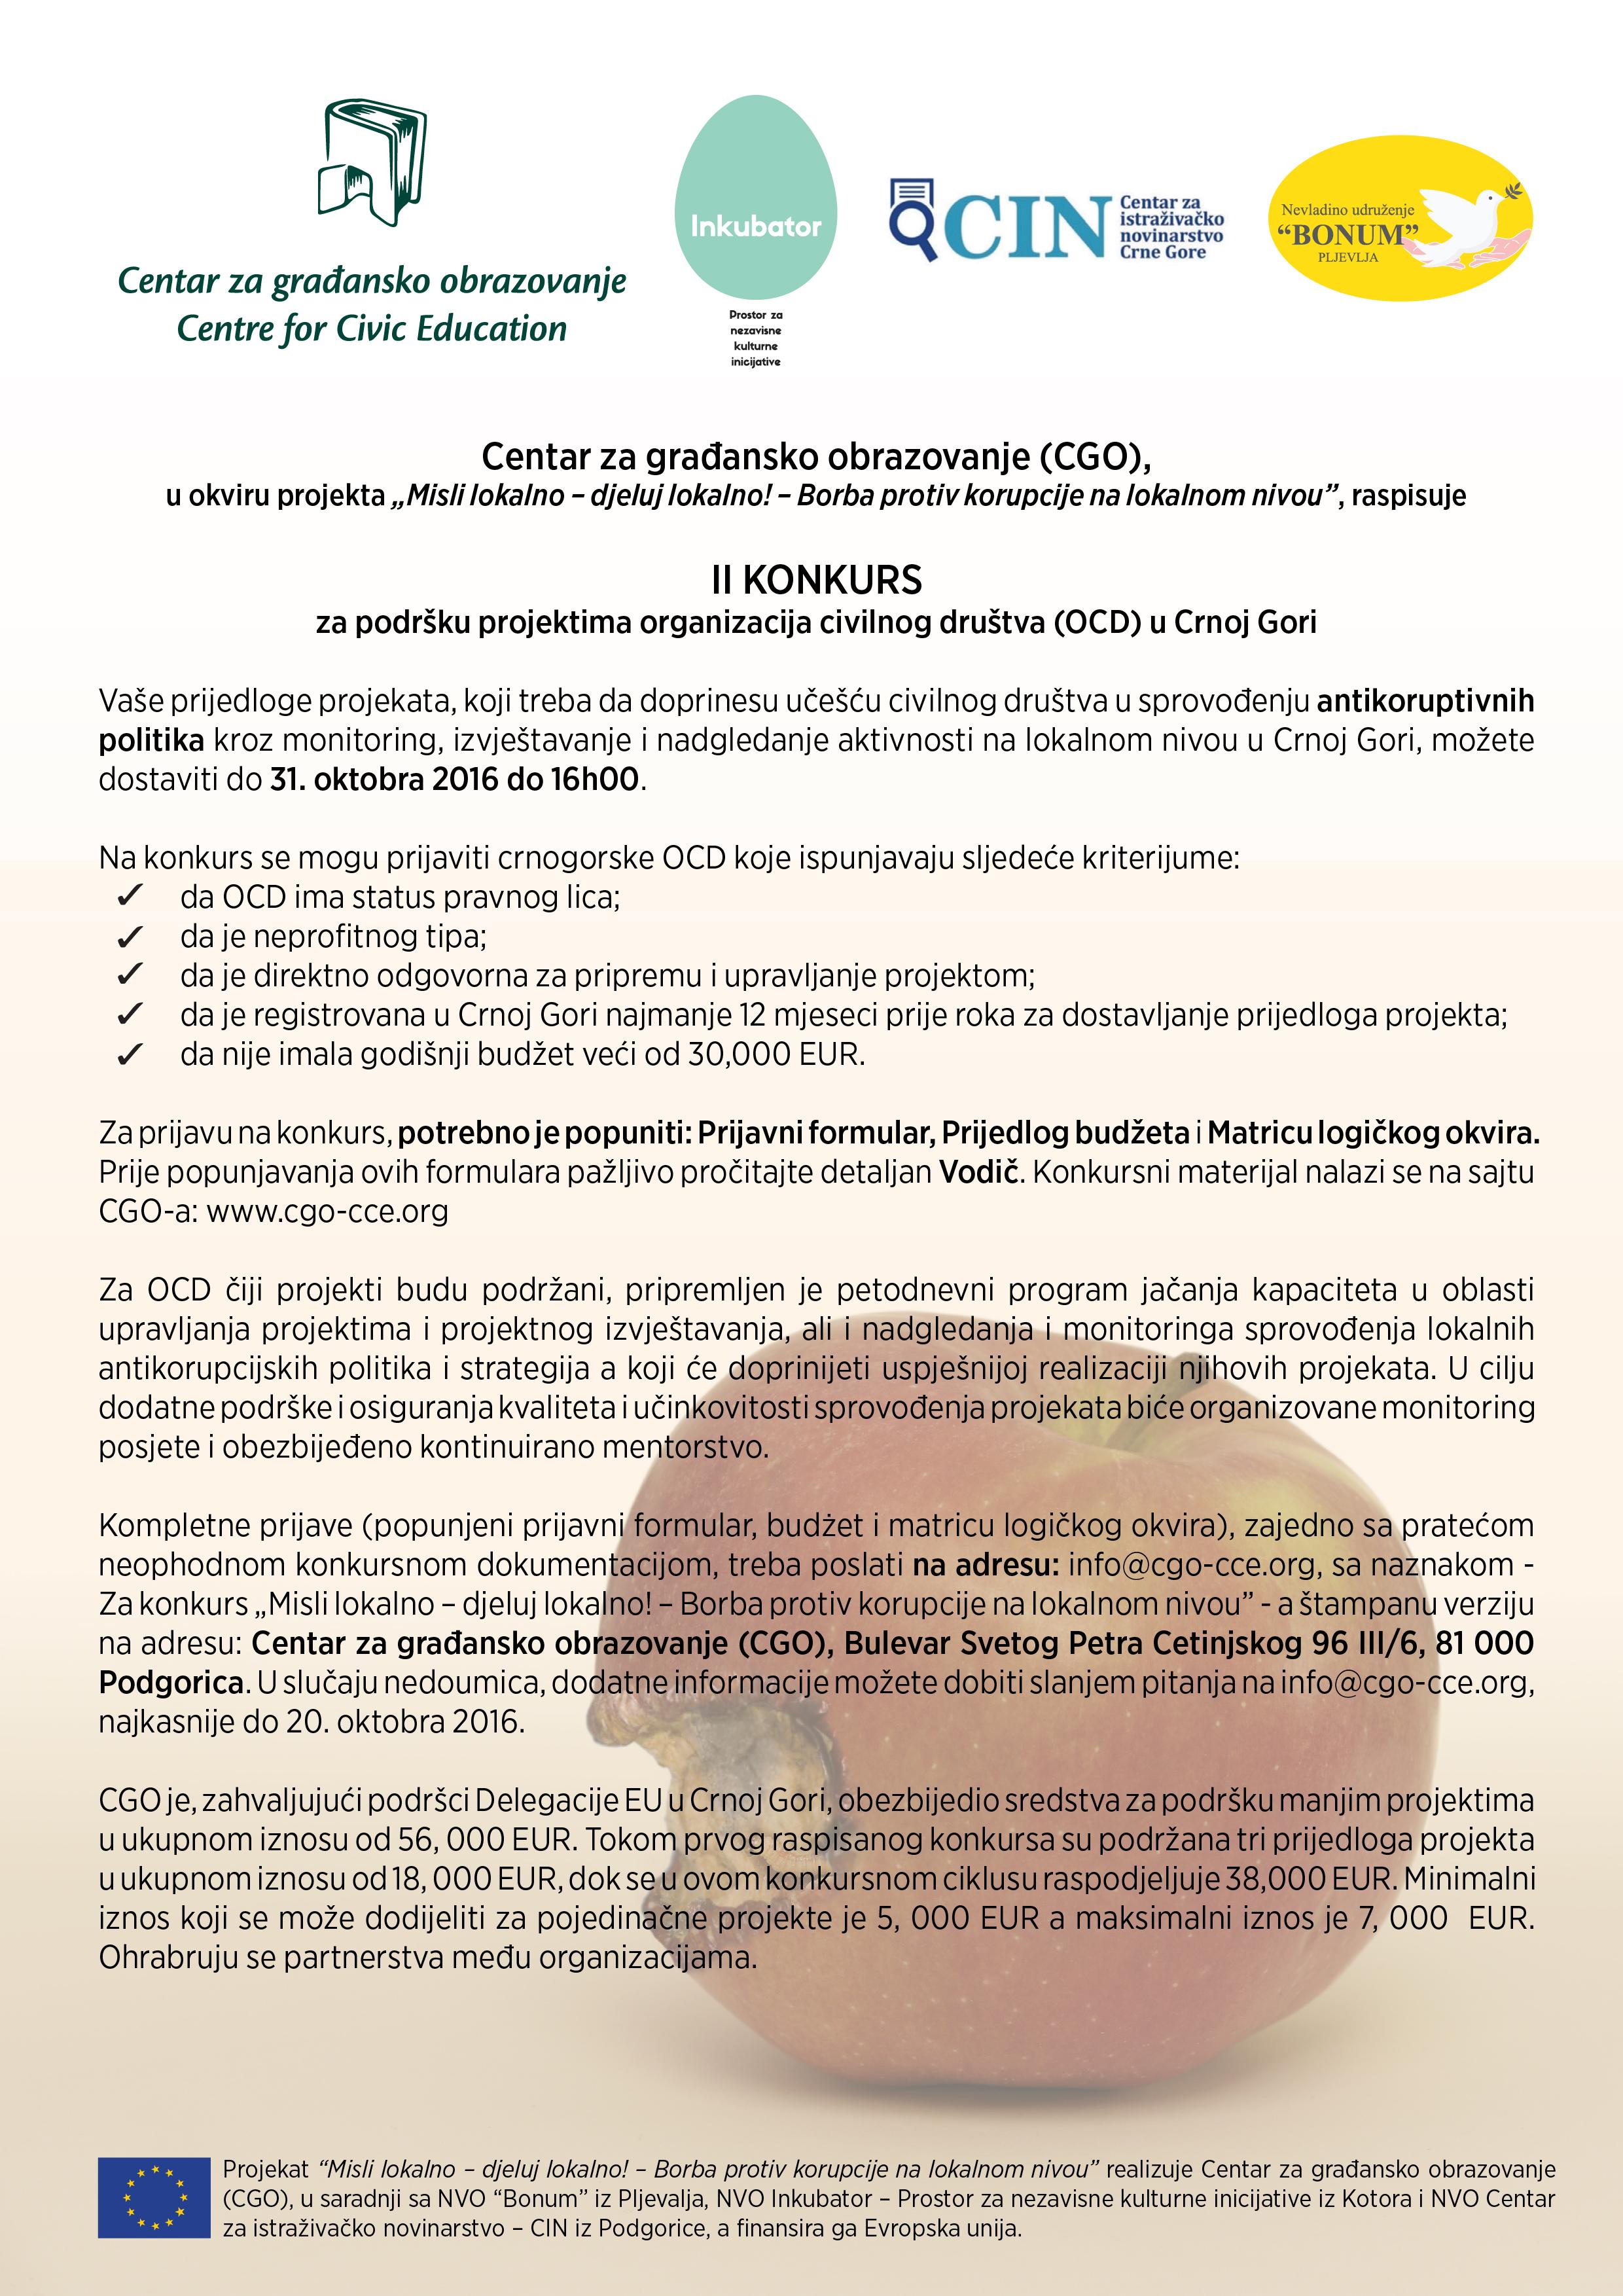 cgo-cce-II konkurs-01